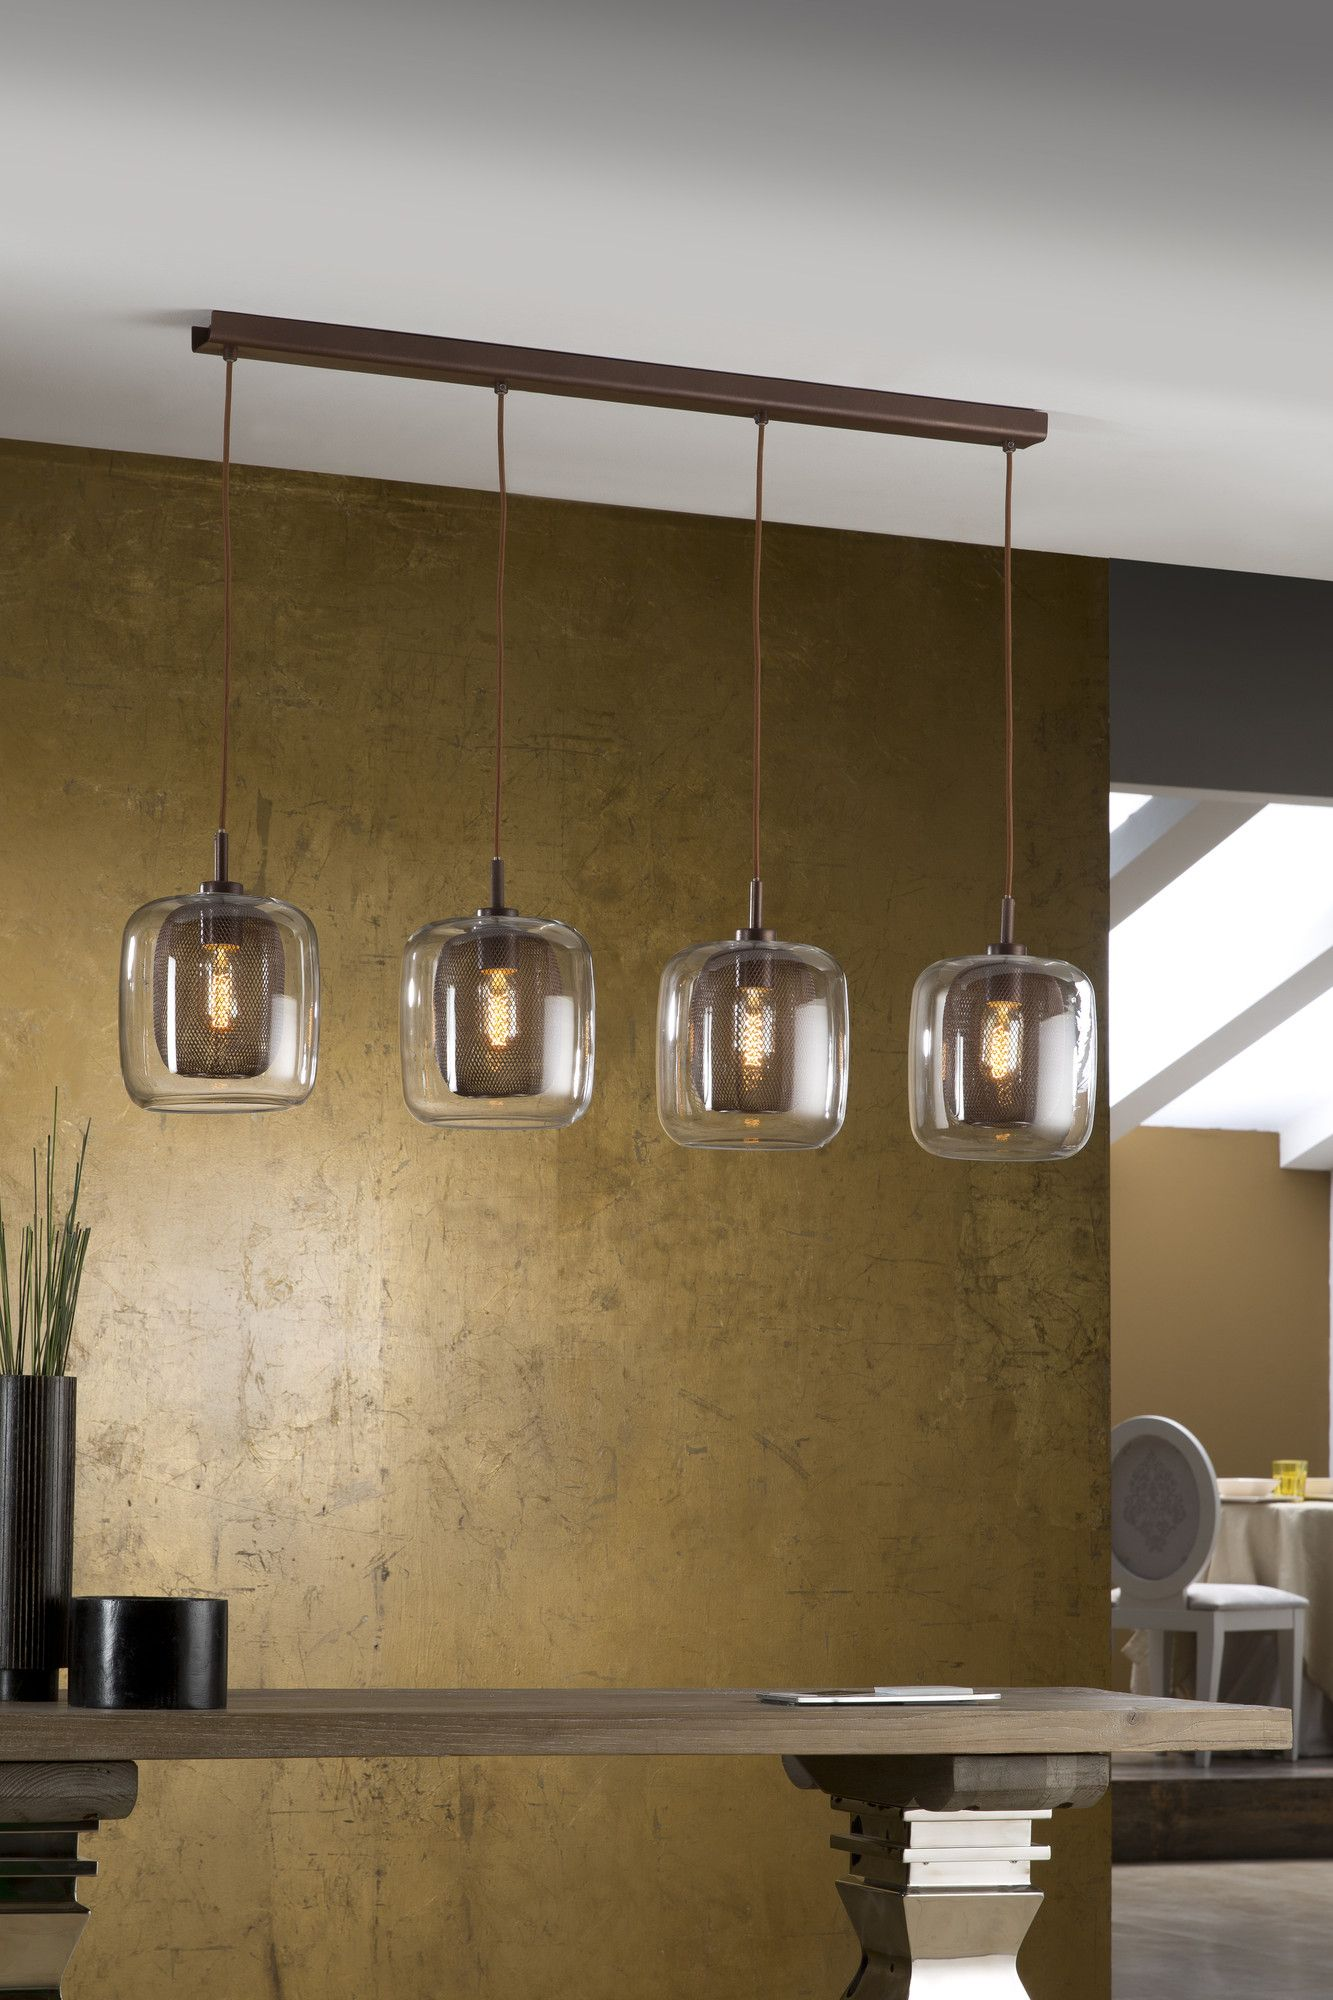 pendant lights for kitchen wayfair # 82